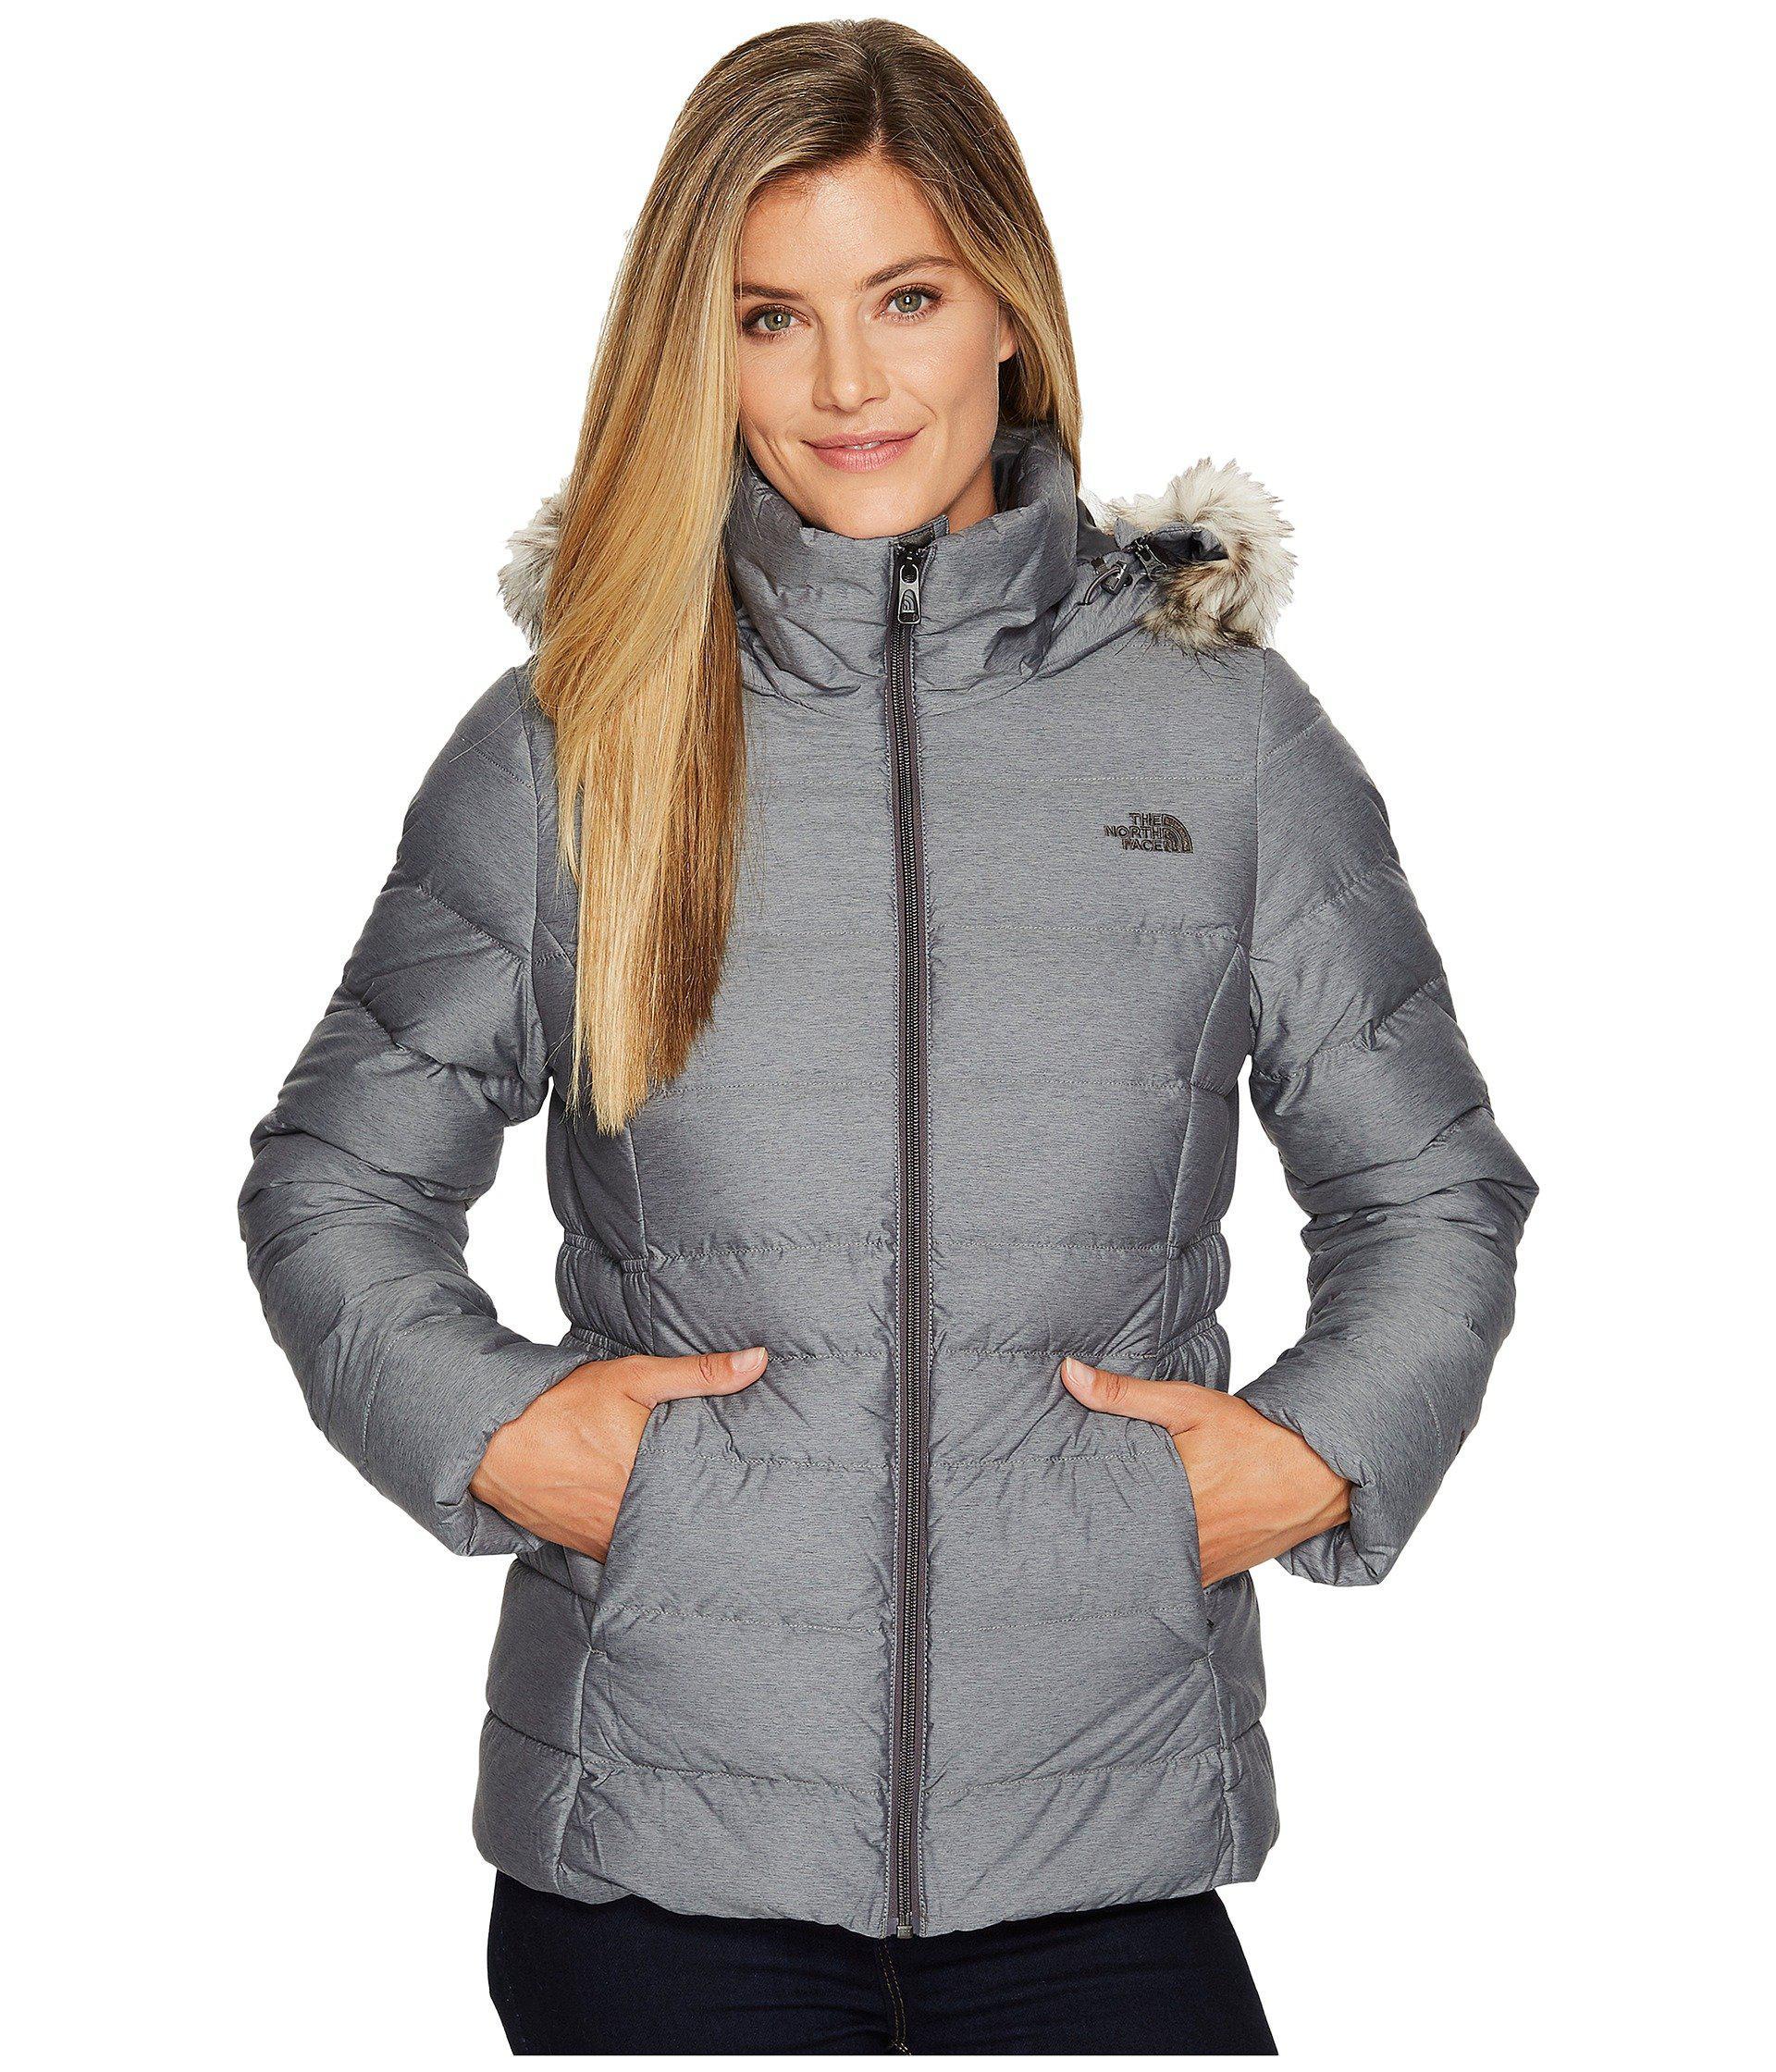 3852602df wholesale the north face gotham jacket womens 7df7d 03b3f